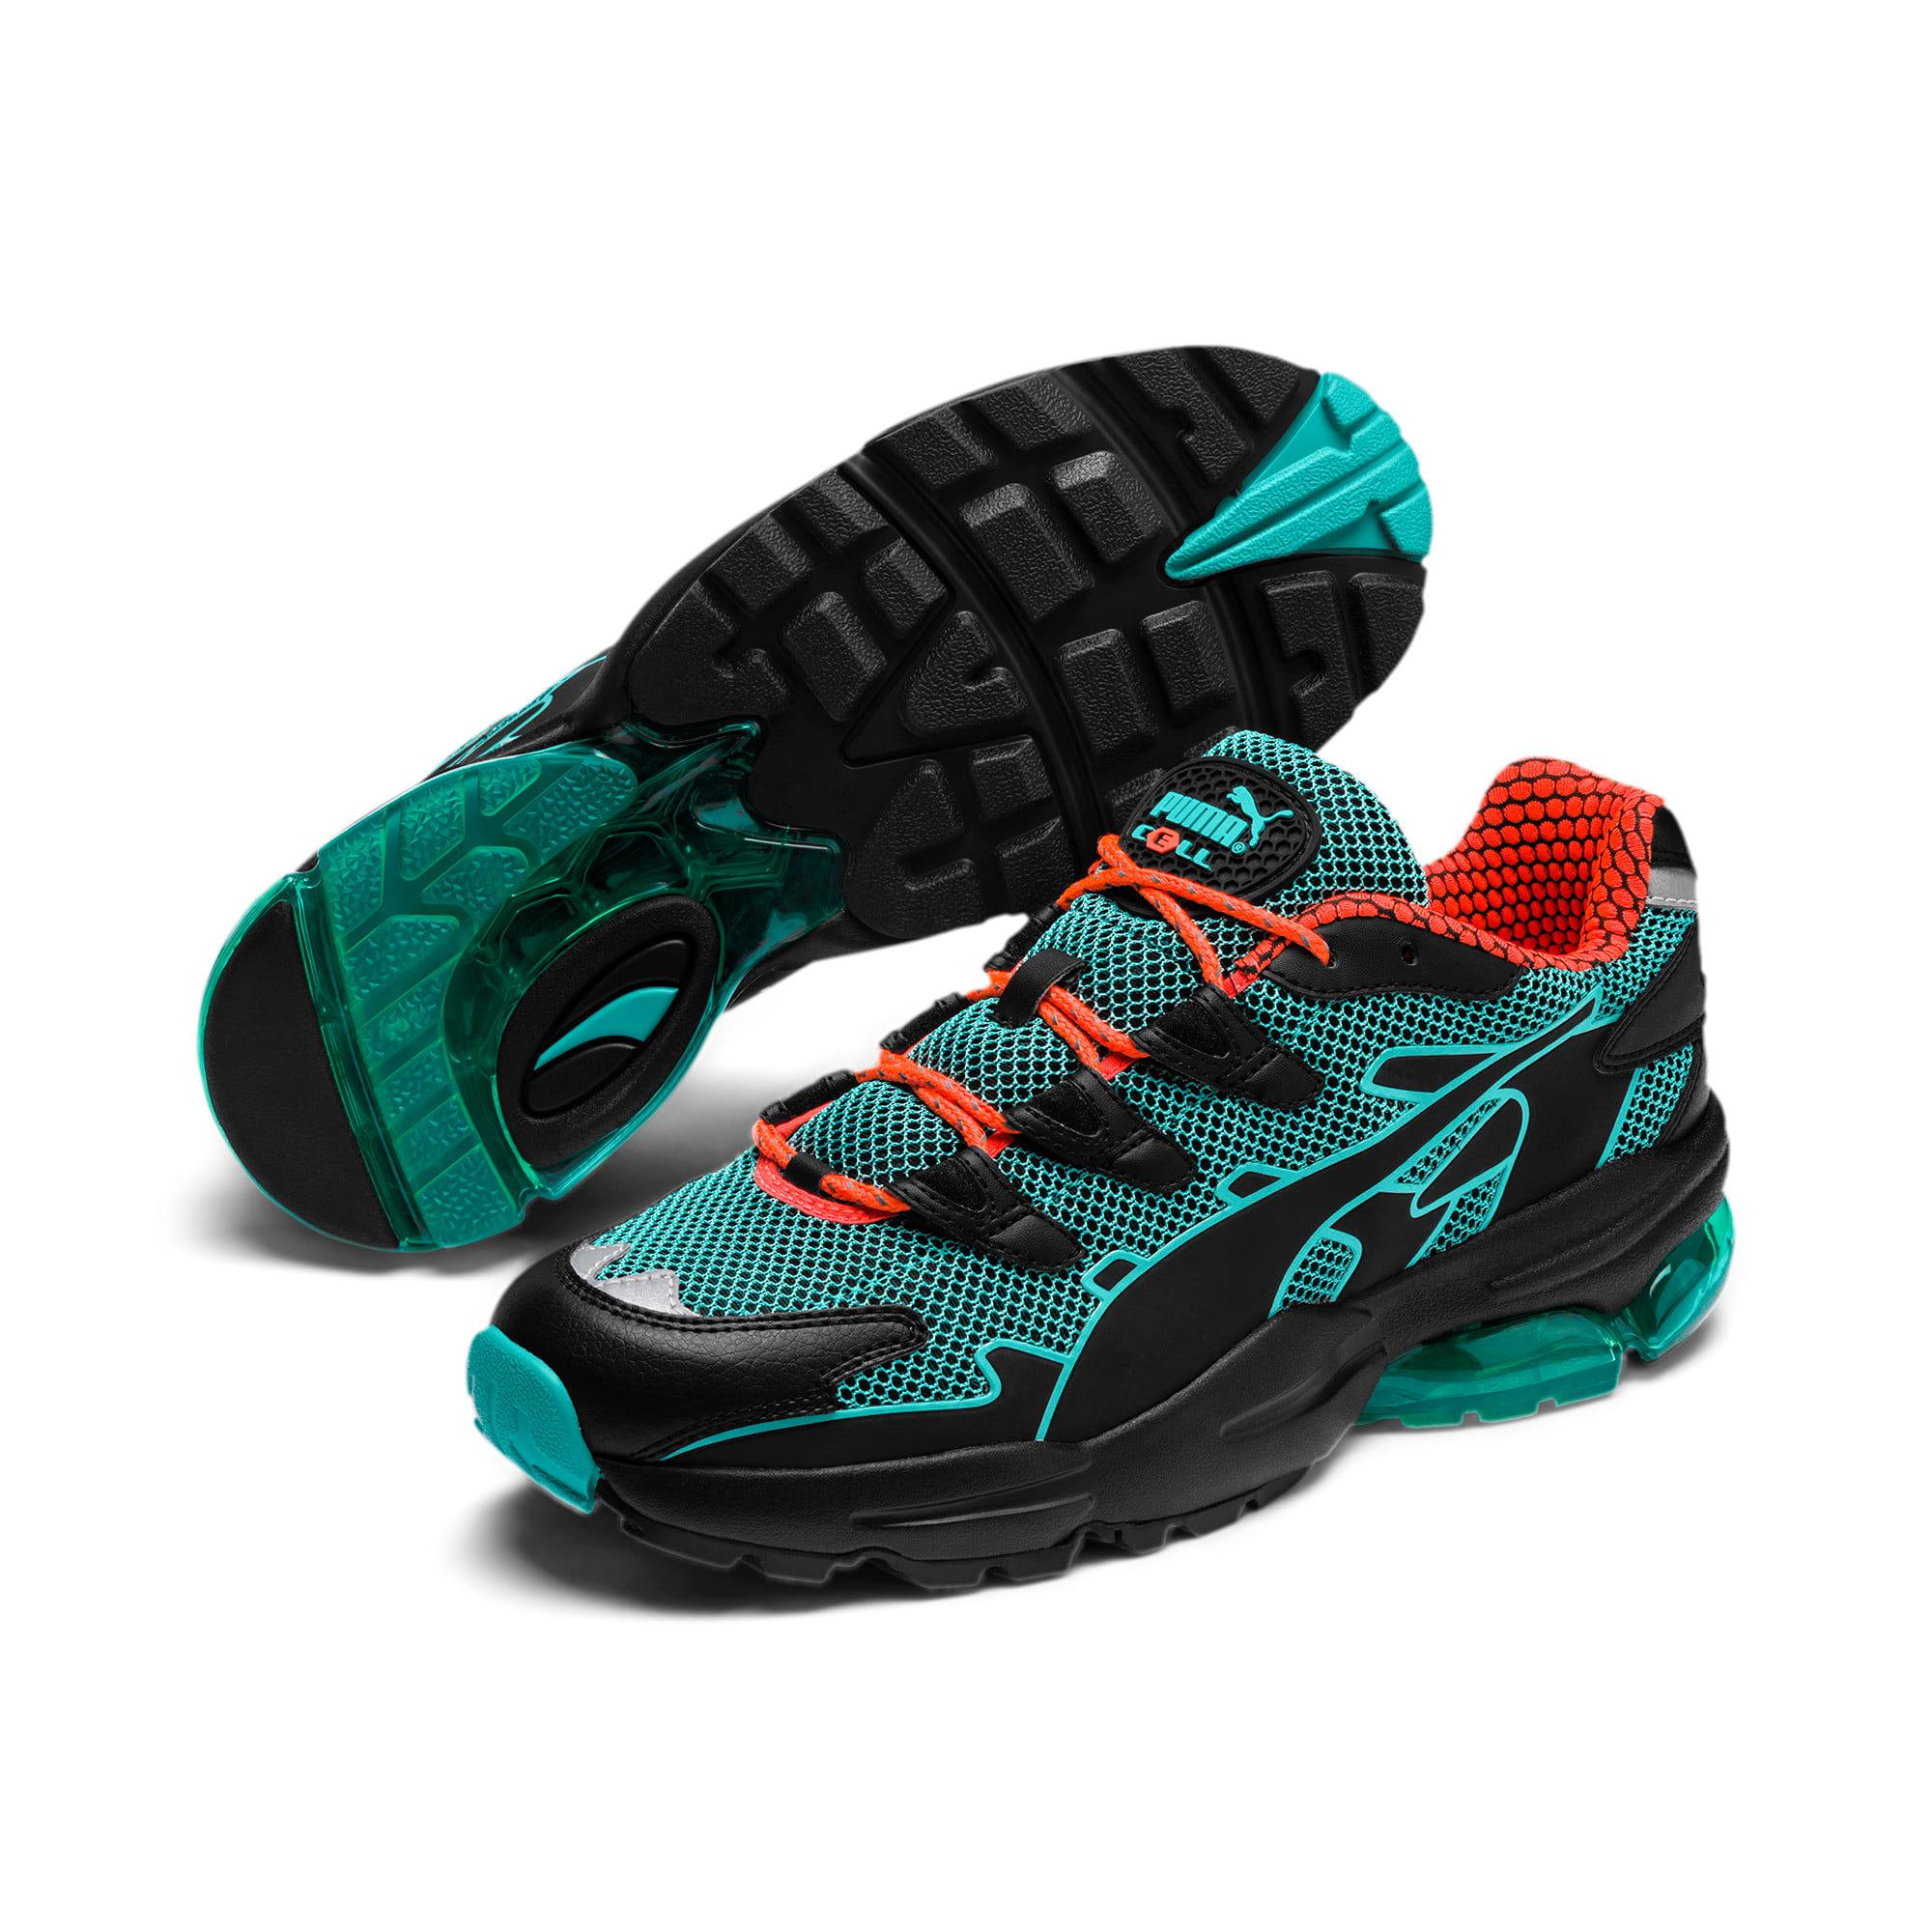 Thumbnail 3 of CELL Alien Kotto Sneakers, Puma Black-Blue Turquoise, medium